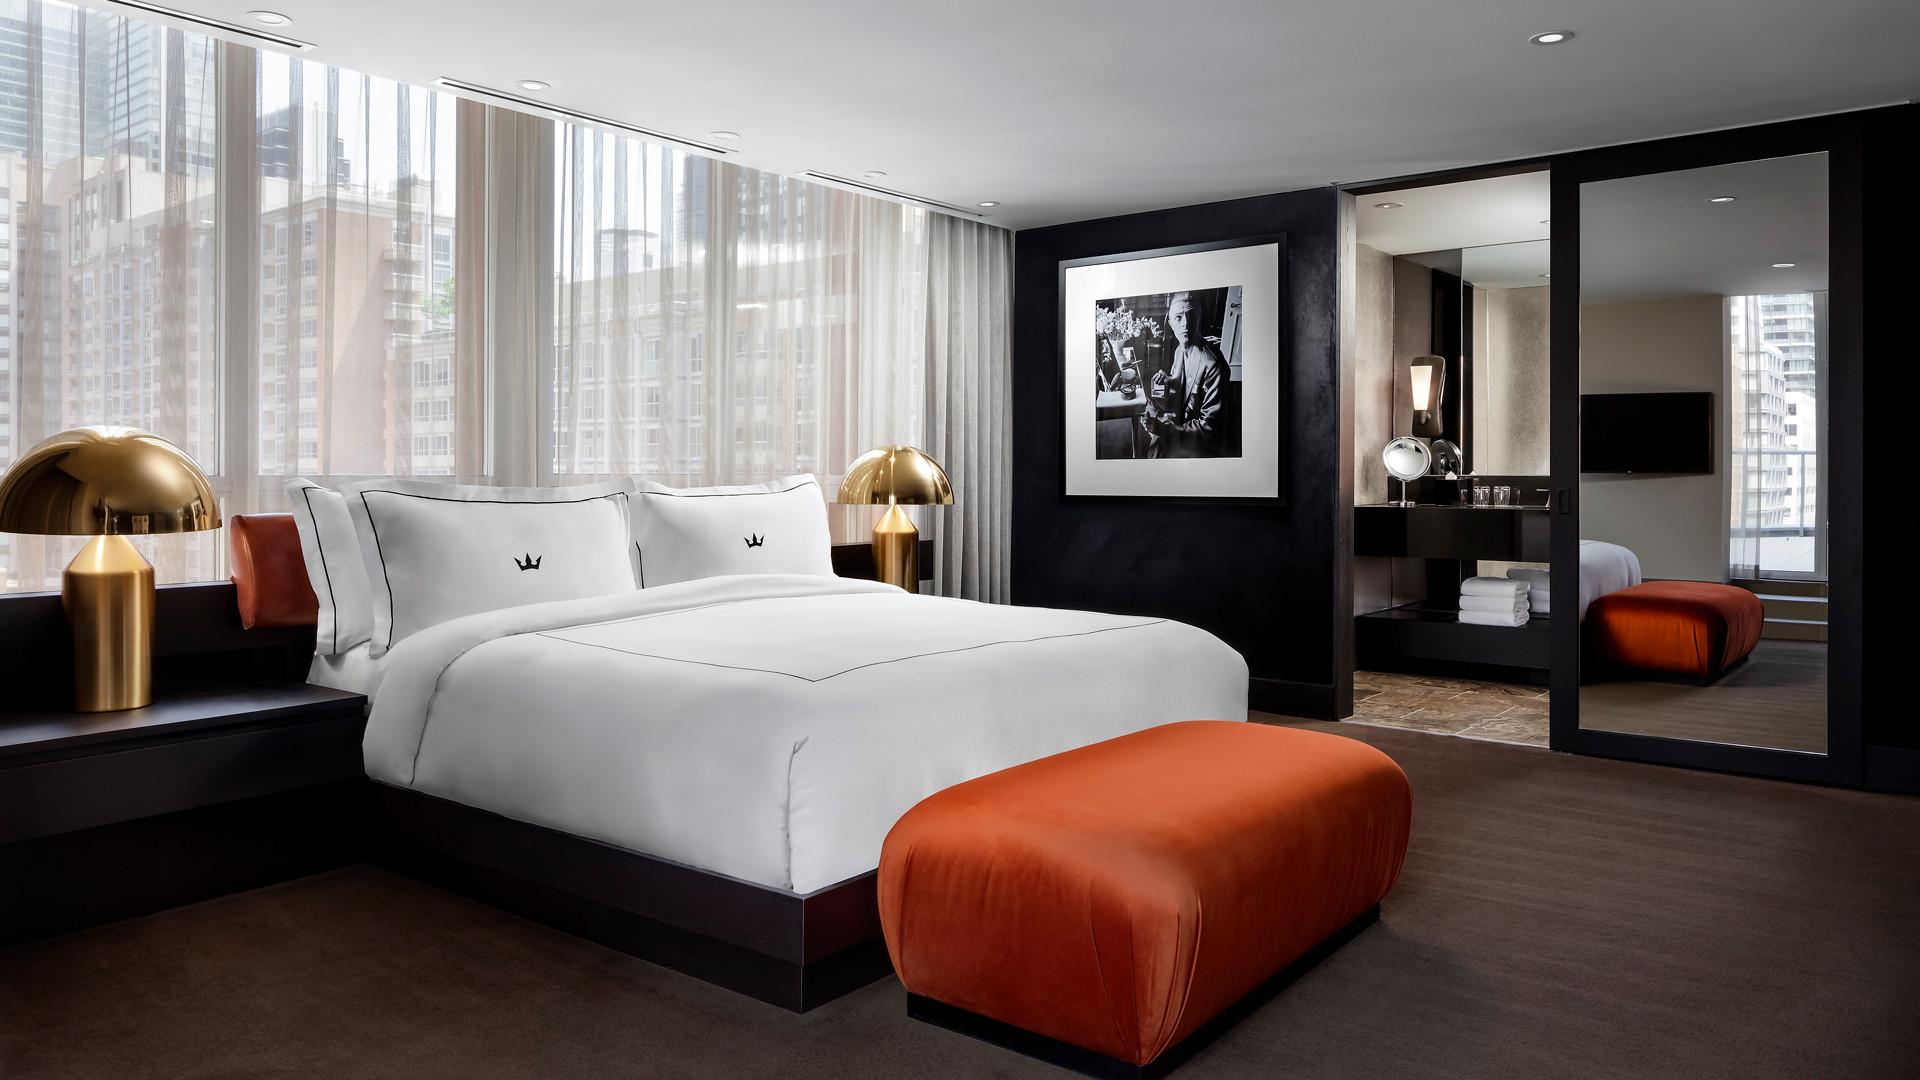 A guestroom at the Bisha Hotel Toronto